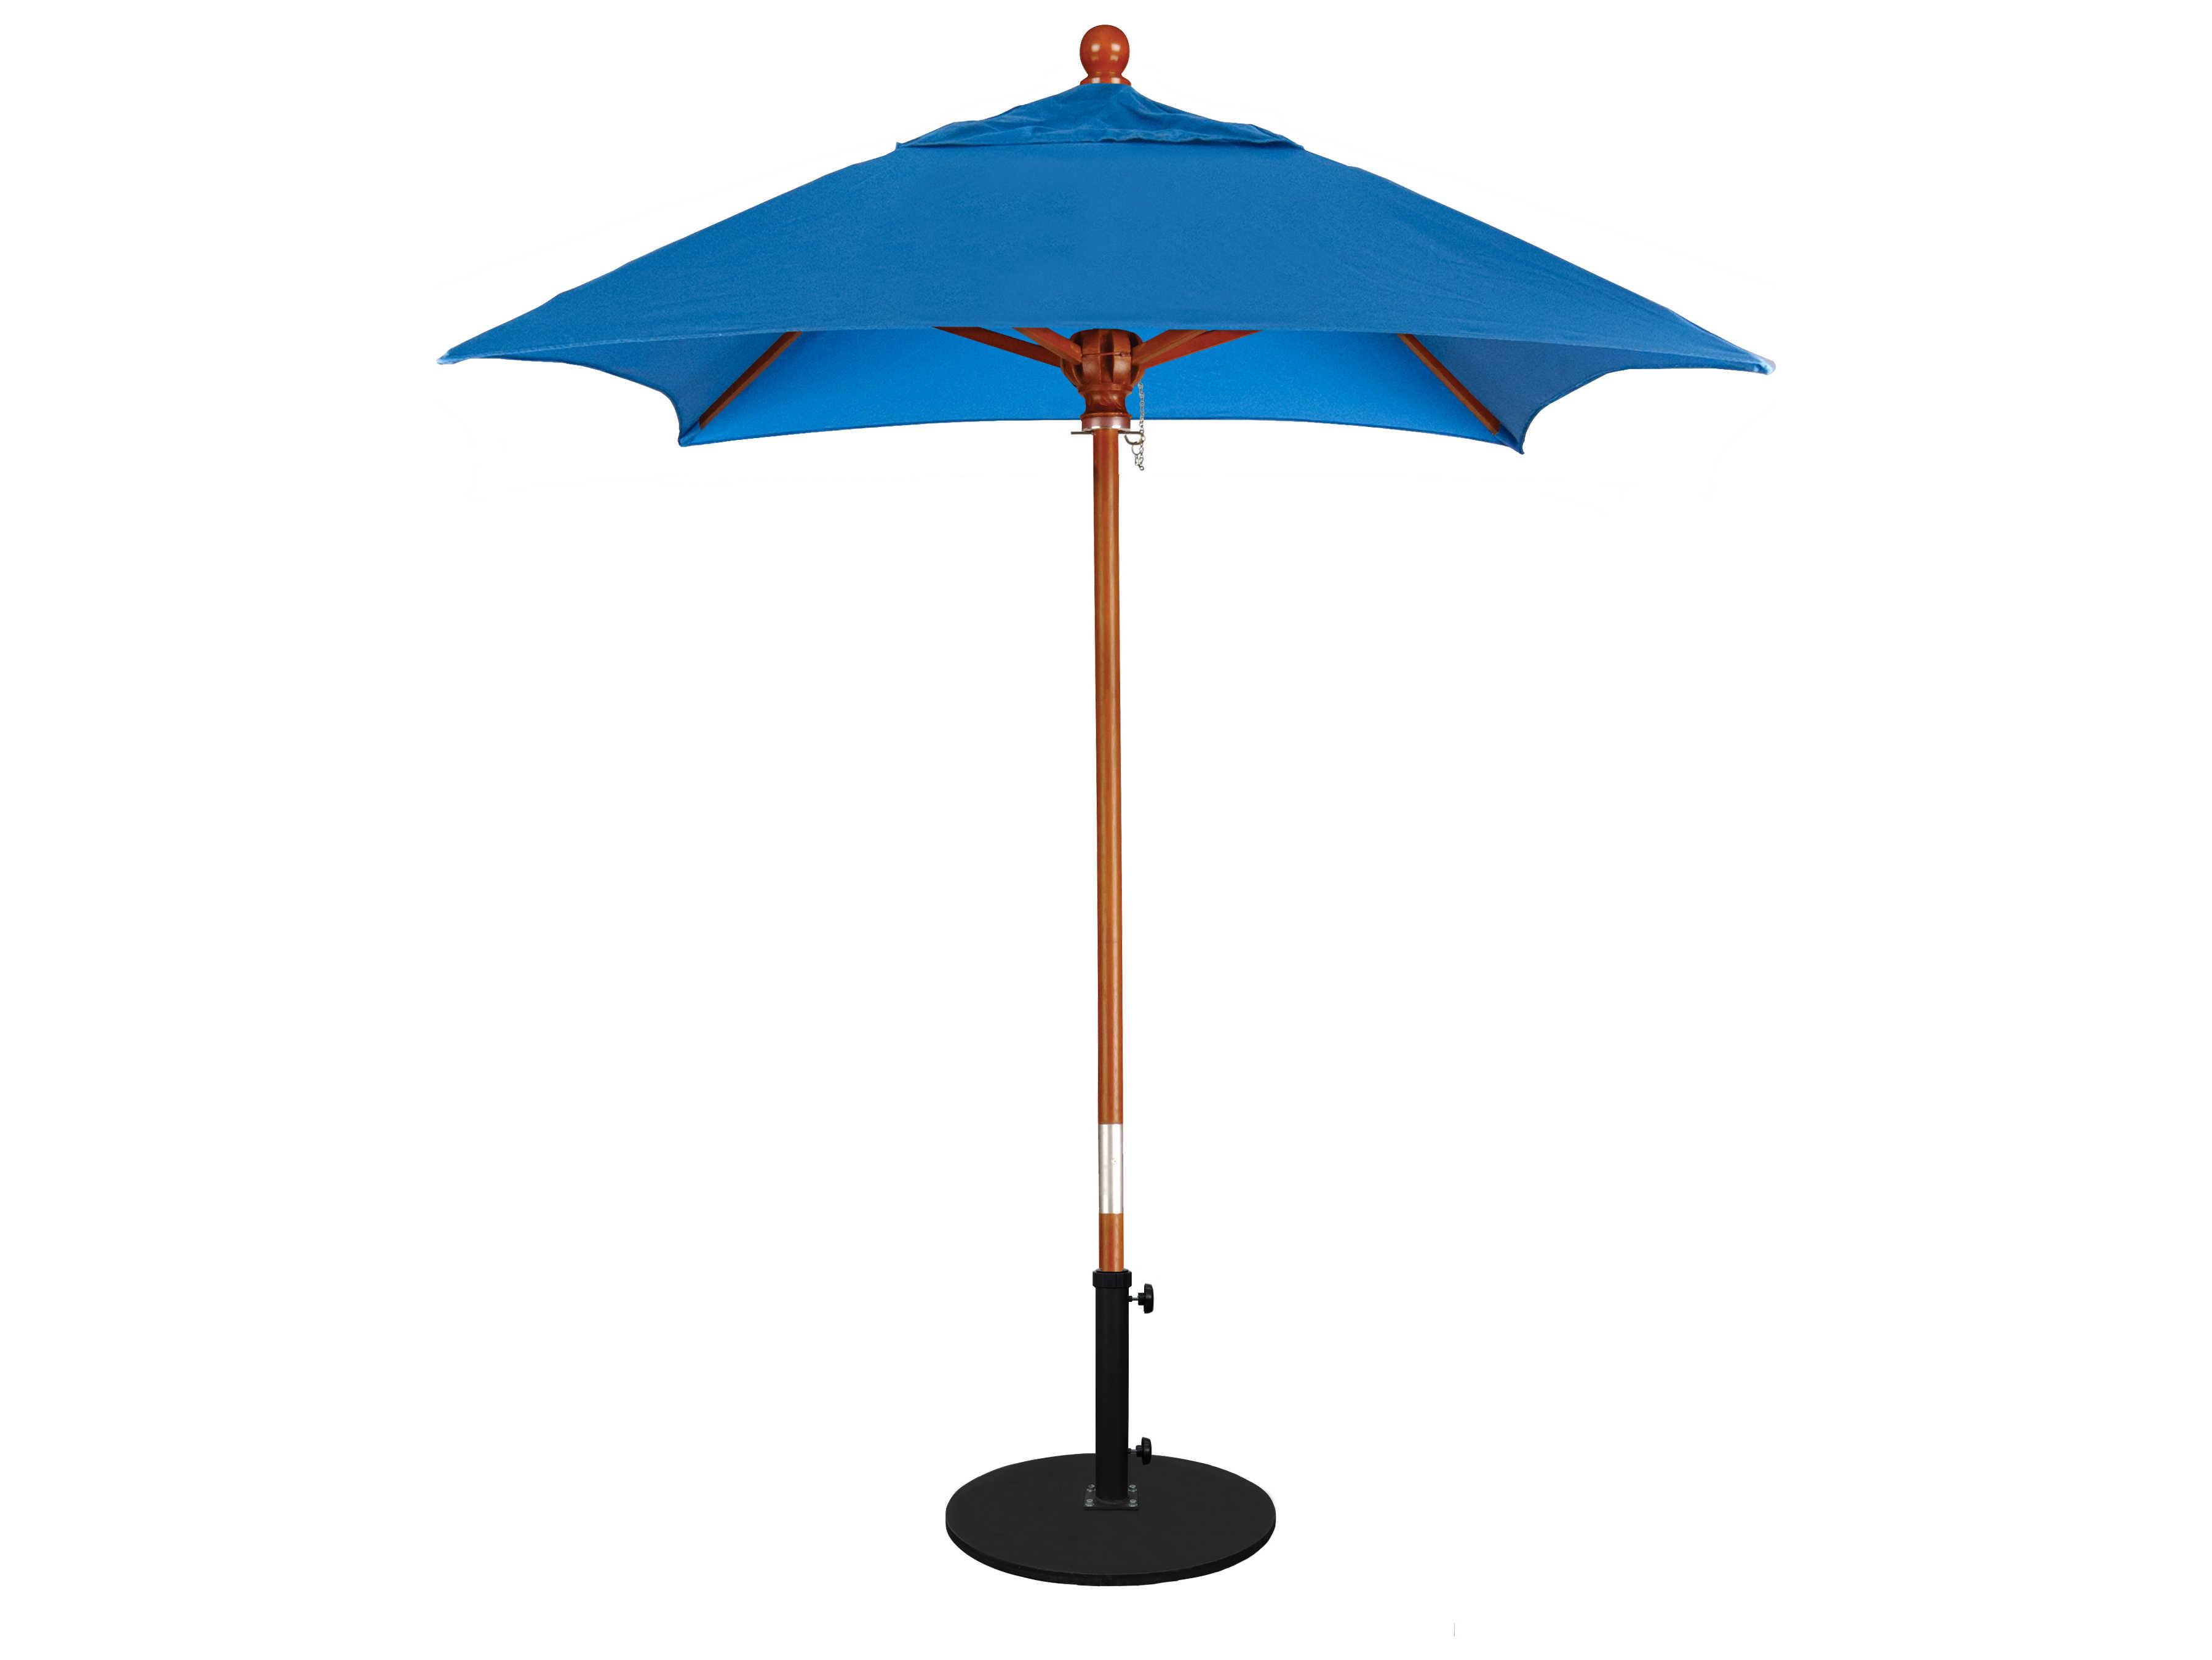 california umbrella grove series 6 foot square market wood umbrella with push lift system mare604. Black Bedroom Furniture Sets. Home Design Ideas